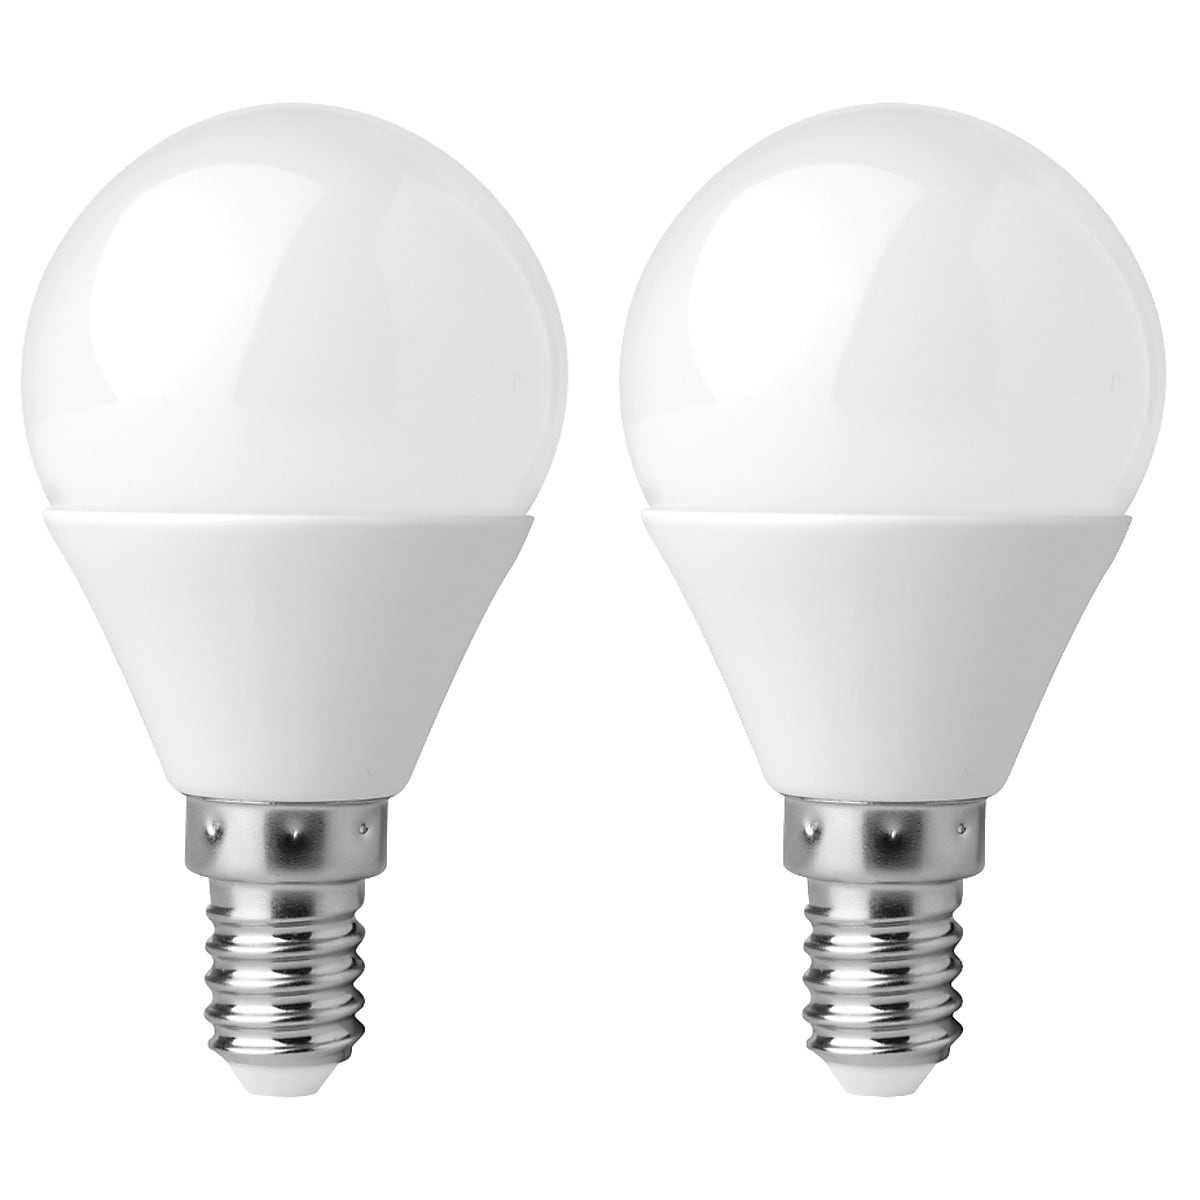 LED-lamppu E14 Clas Ohlson 2 kpl